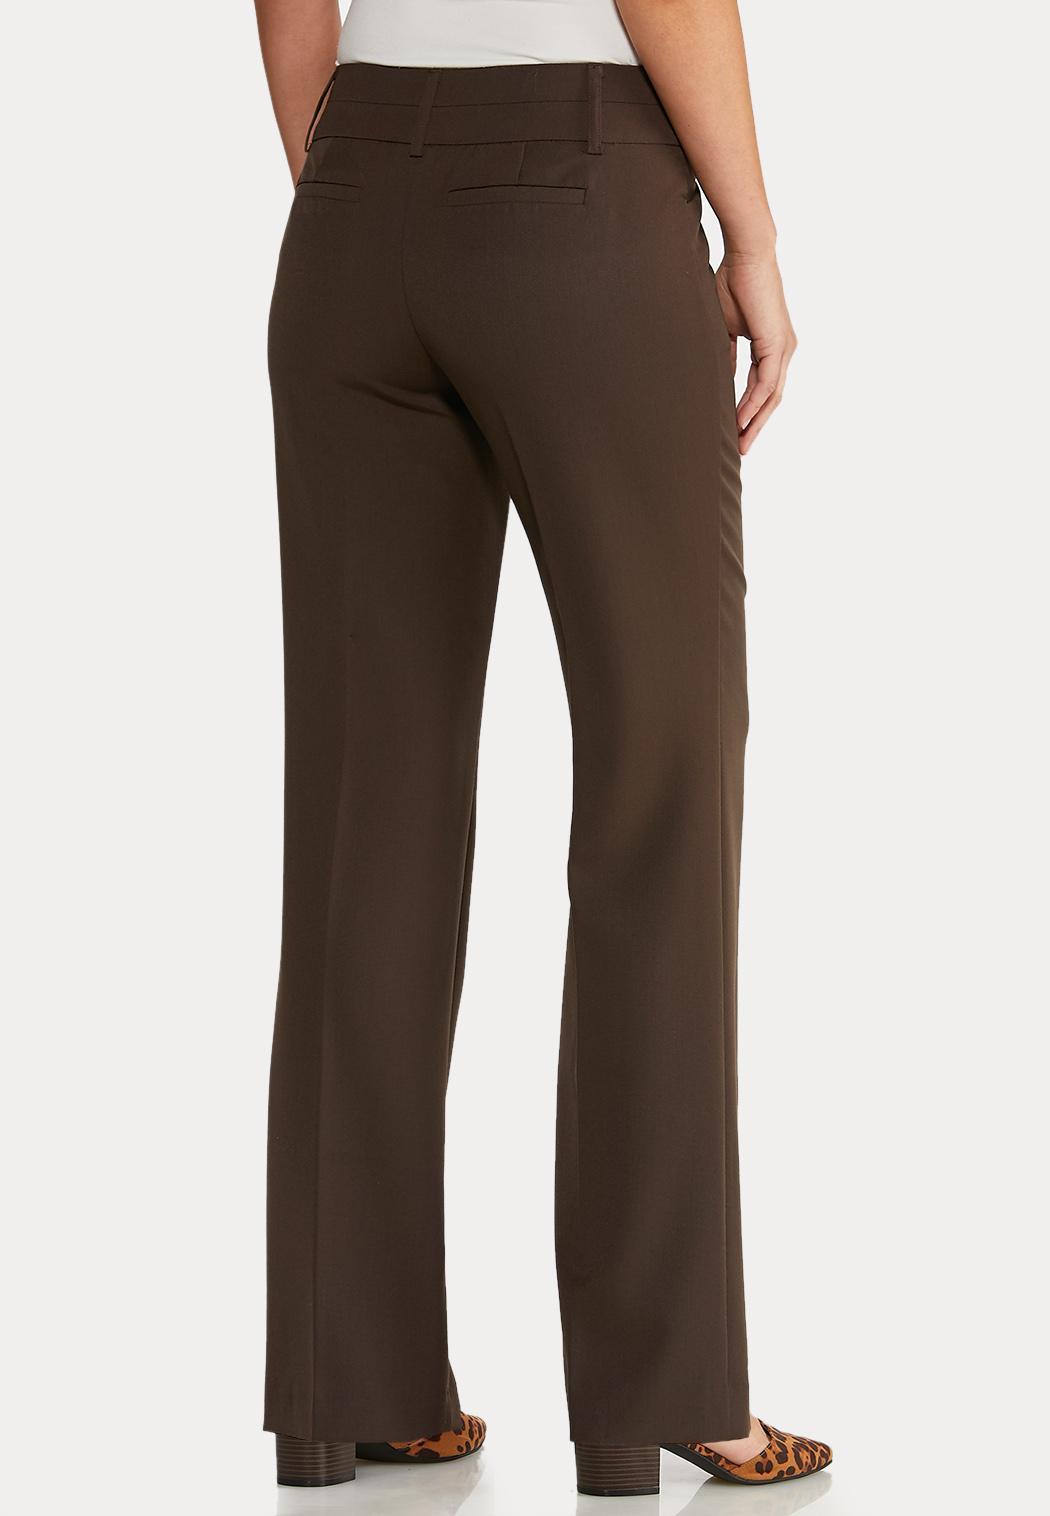 Petite Shape Enhancing Trouser Pants (Item #43967697)